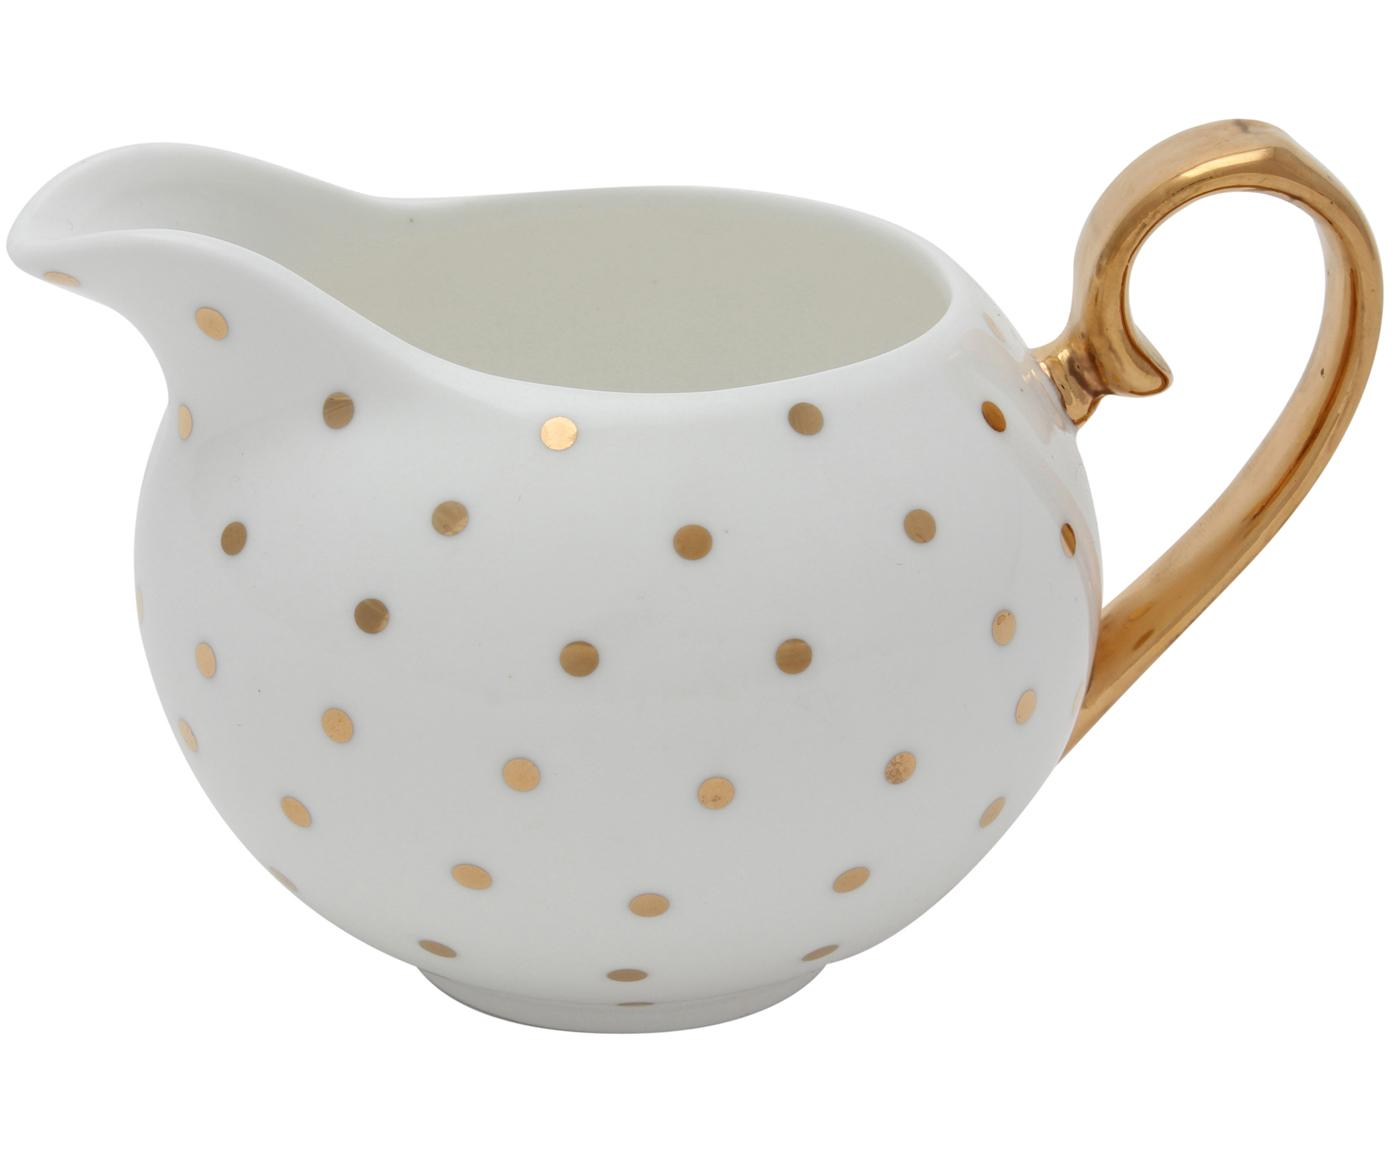 Melkkannetje Miss Golightly, Beenderporselein, verguld, Wit, goud, Ø 6 x H 7 cm